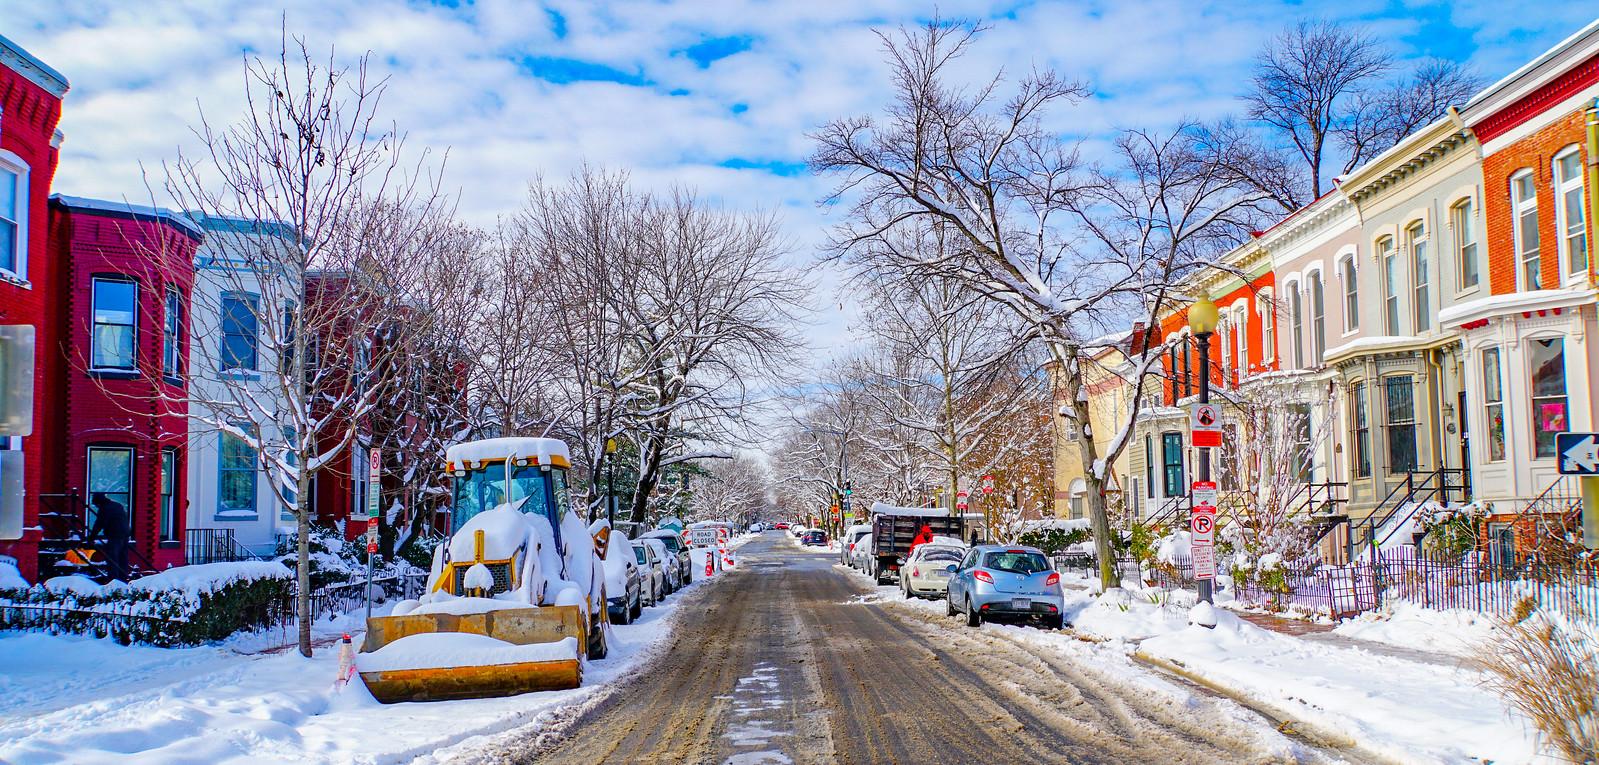 2019.01.16 DC People and Places, Washington, DC USA 09620